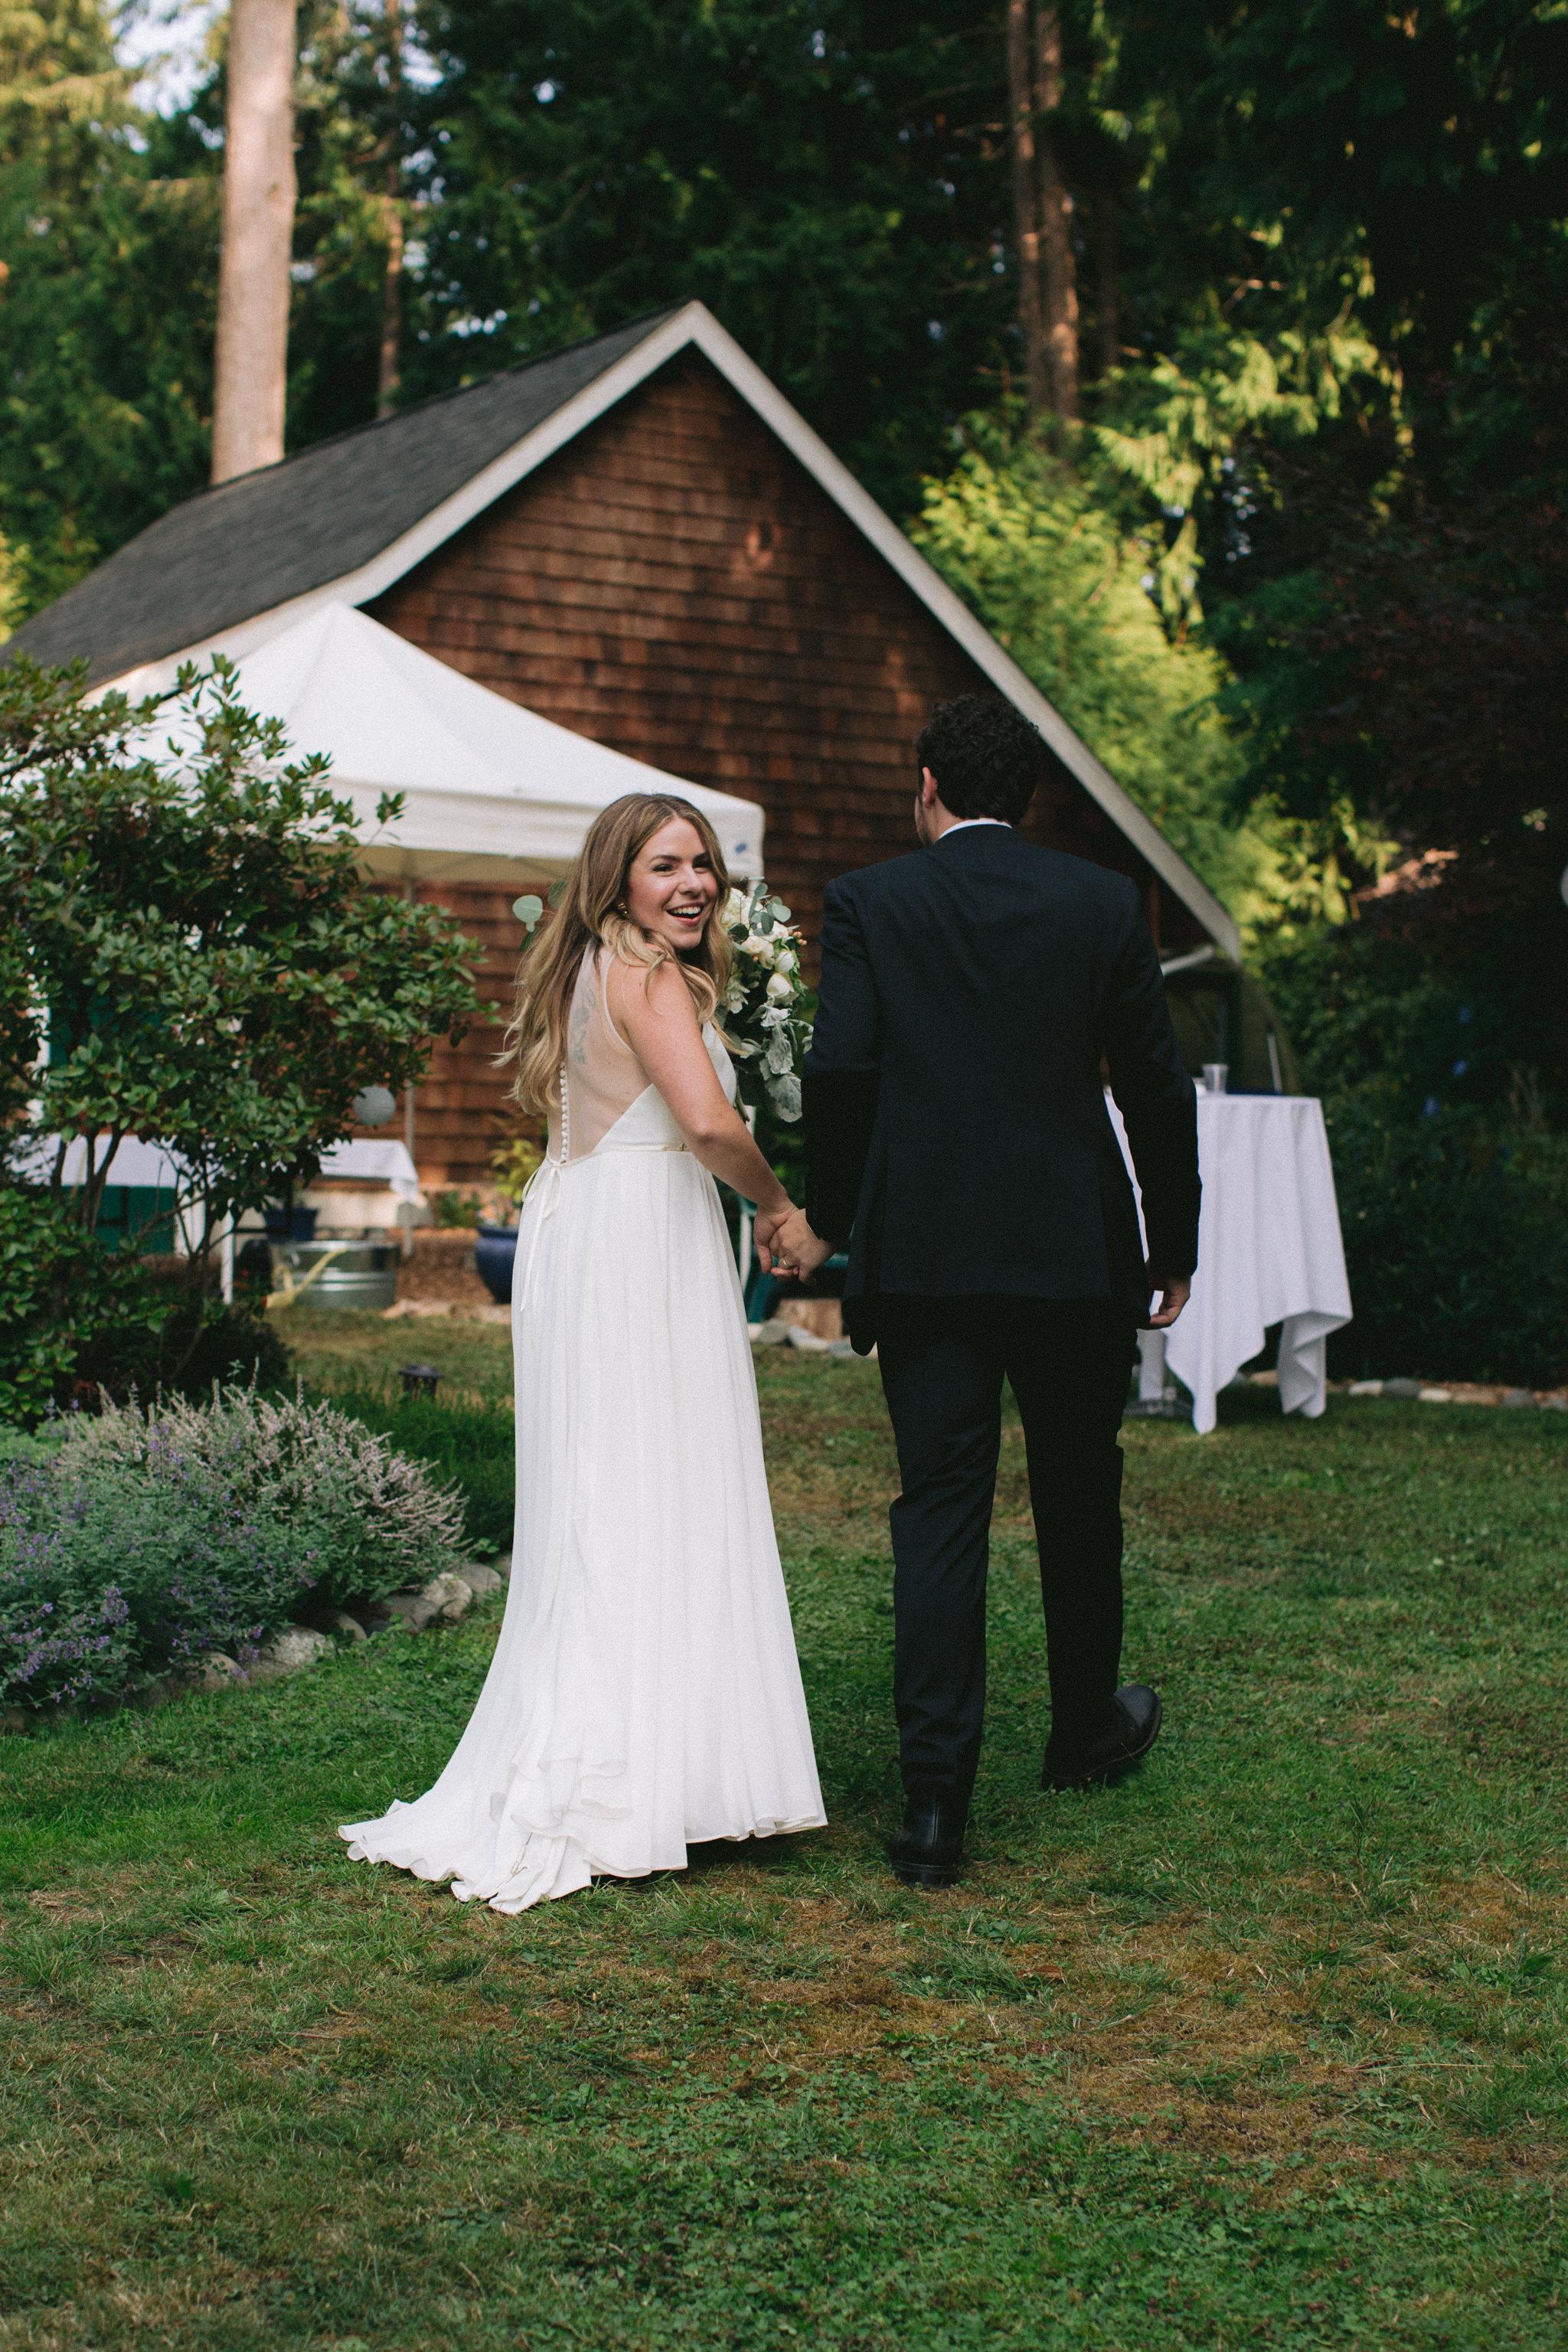 Backyard-Bainbridge-Island-Wedding-Alycia-Lovell-Photography-124.JPG